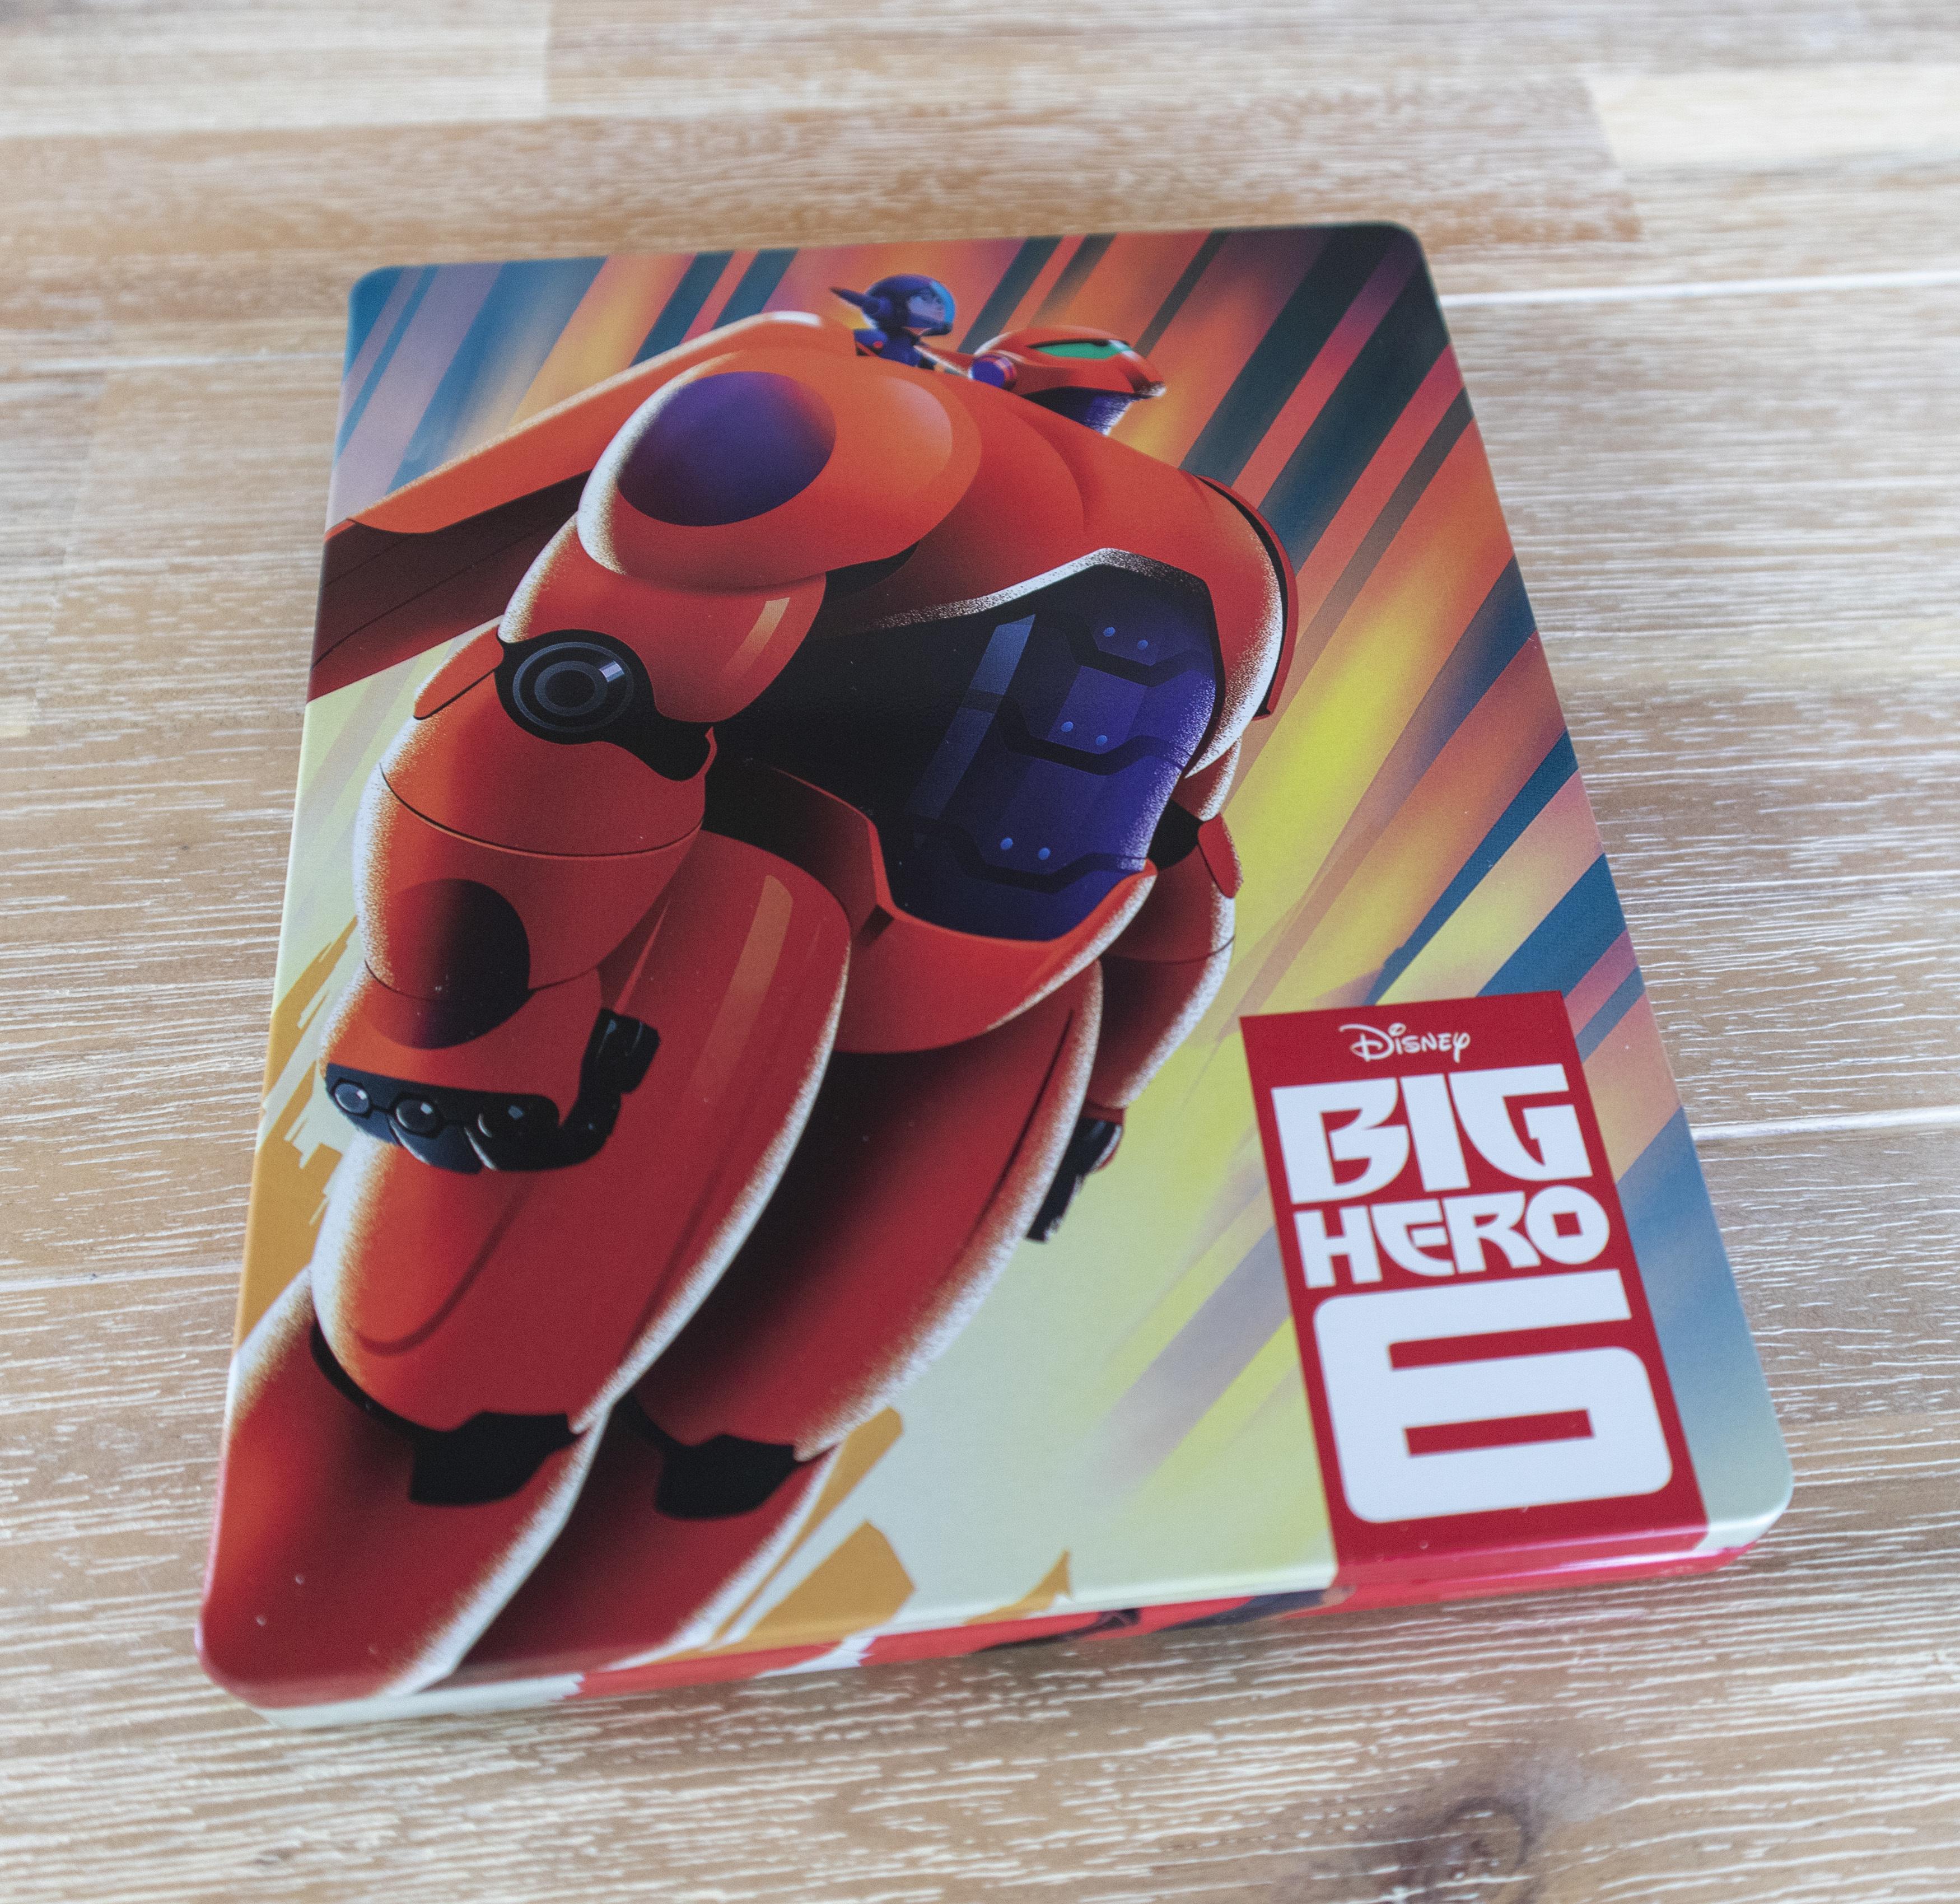 Big Hero 6 4K Ultra hd best buy steelbook ベイマックス スチールブック